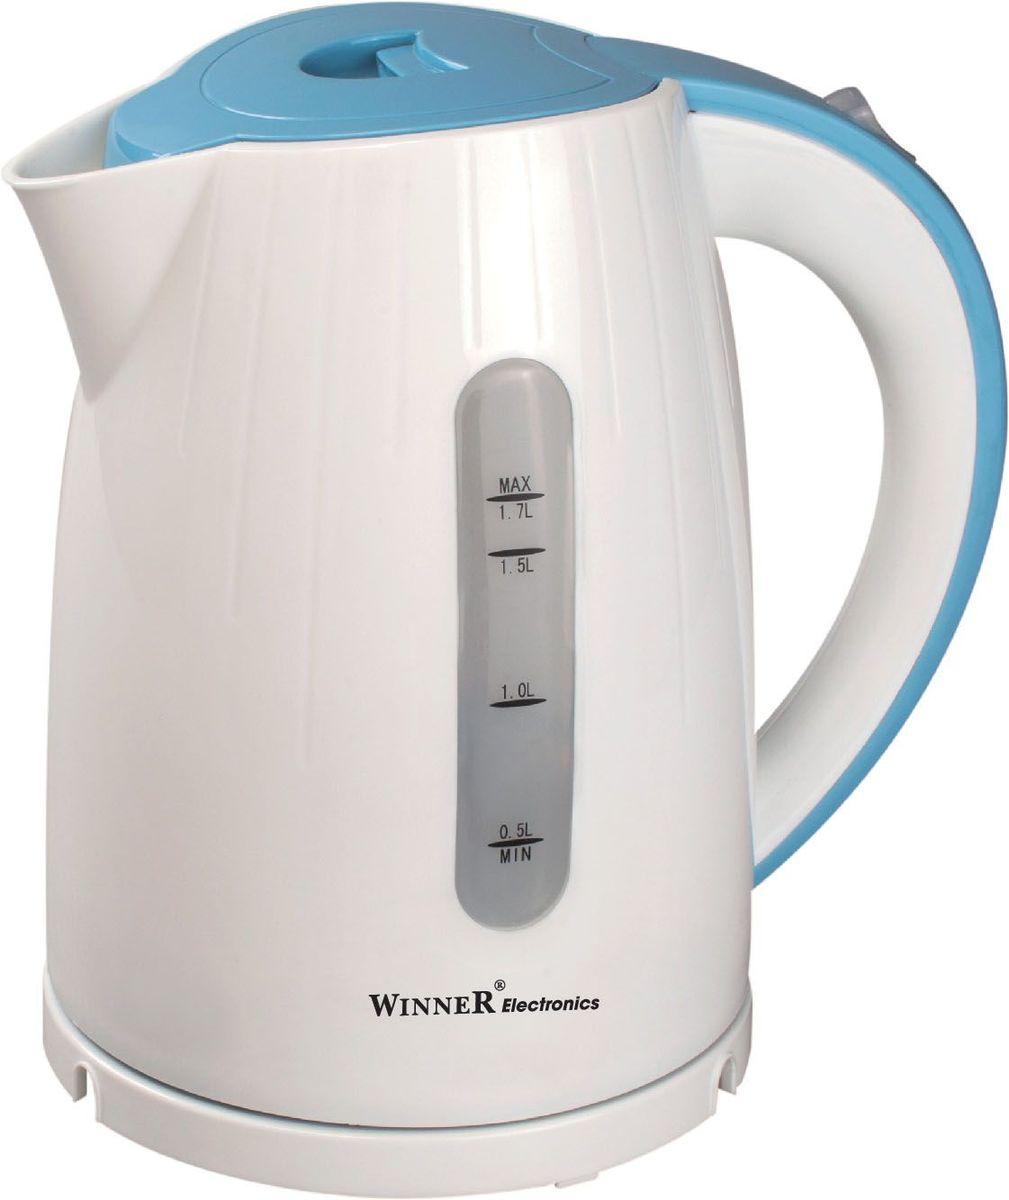 Winner Electronics WR-134 электрический чайник dmwd household water distilled machine pure water distiller filter electric distillation purifier stainless steel 110v 220v 4l